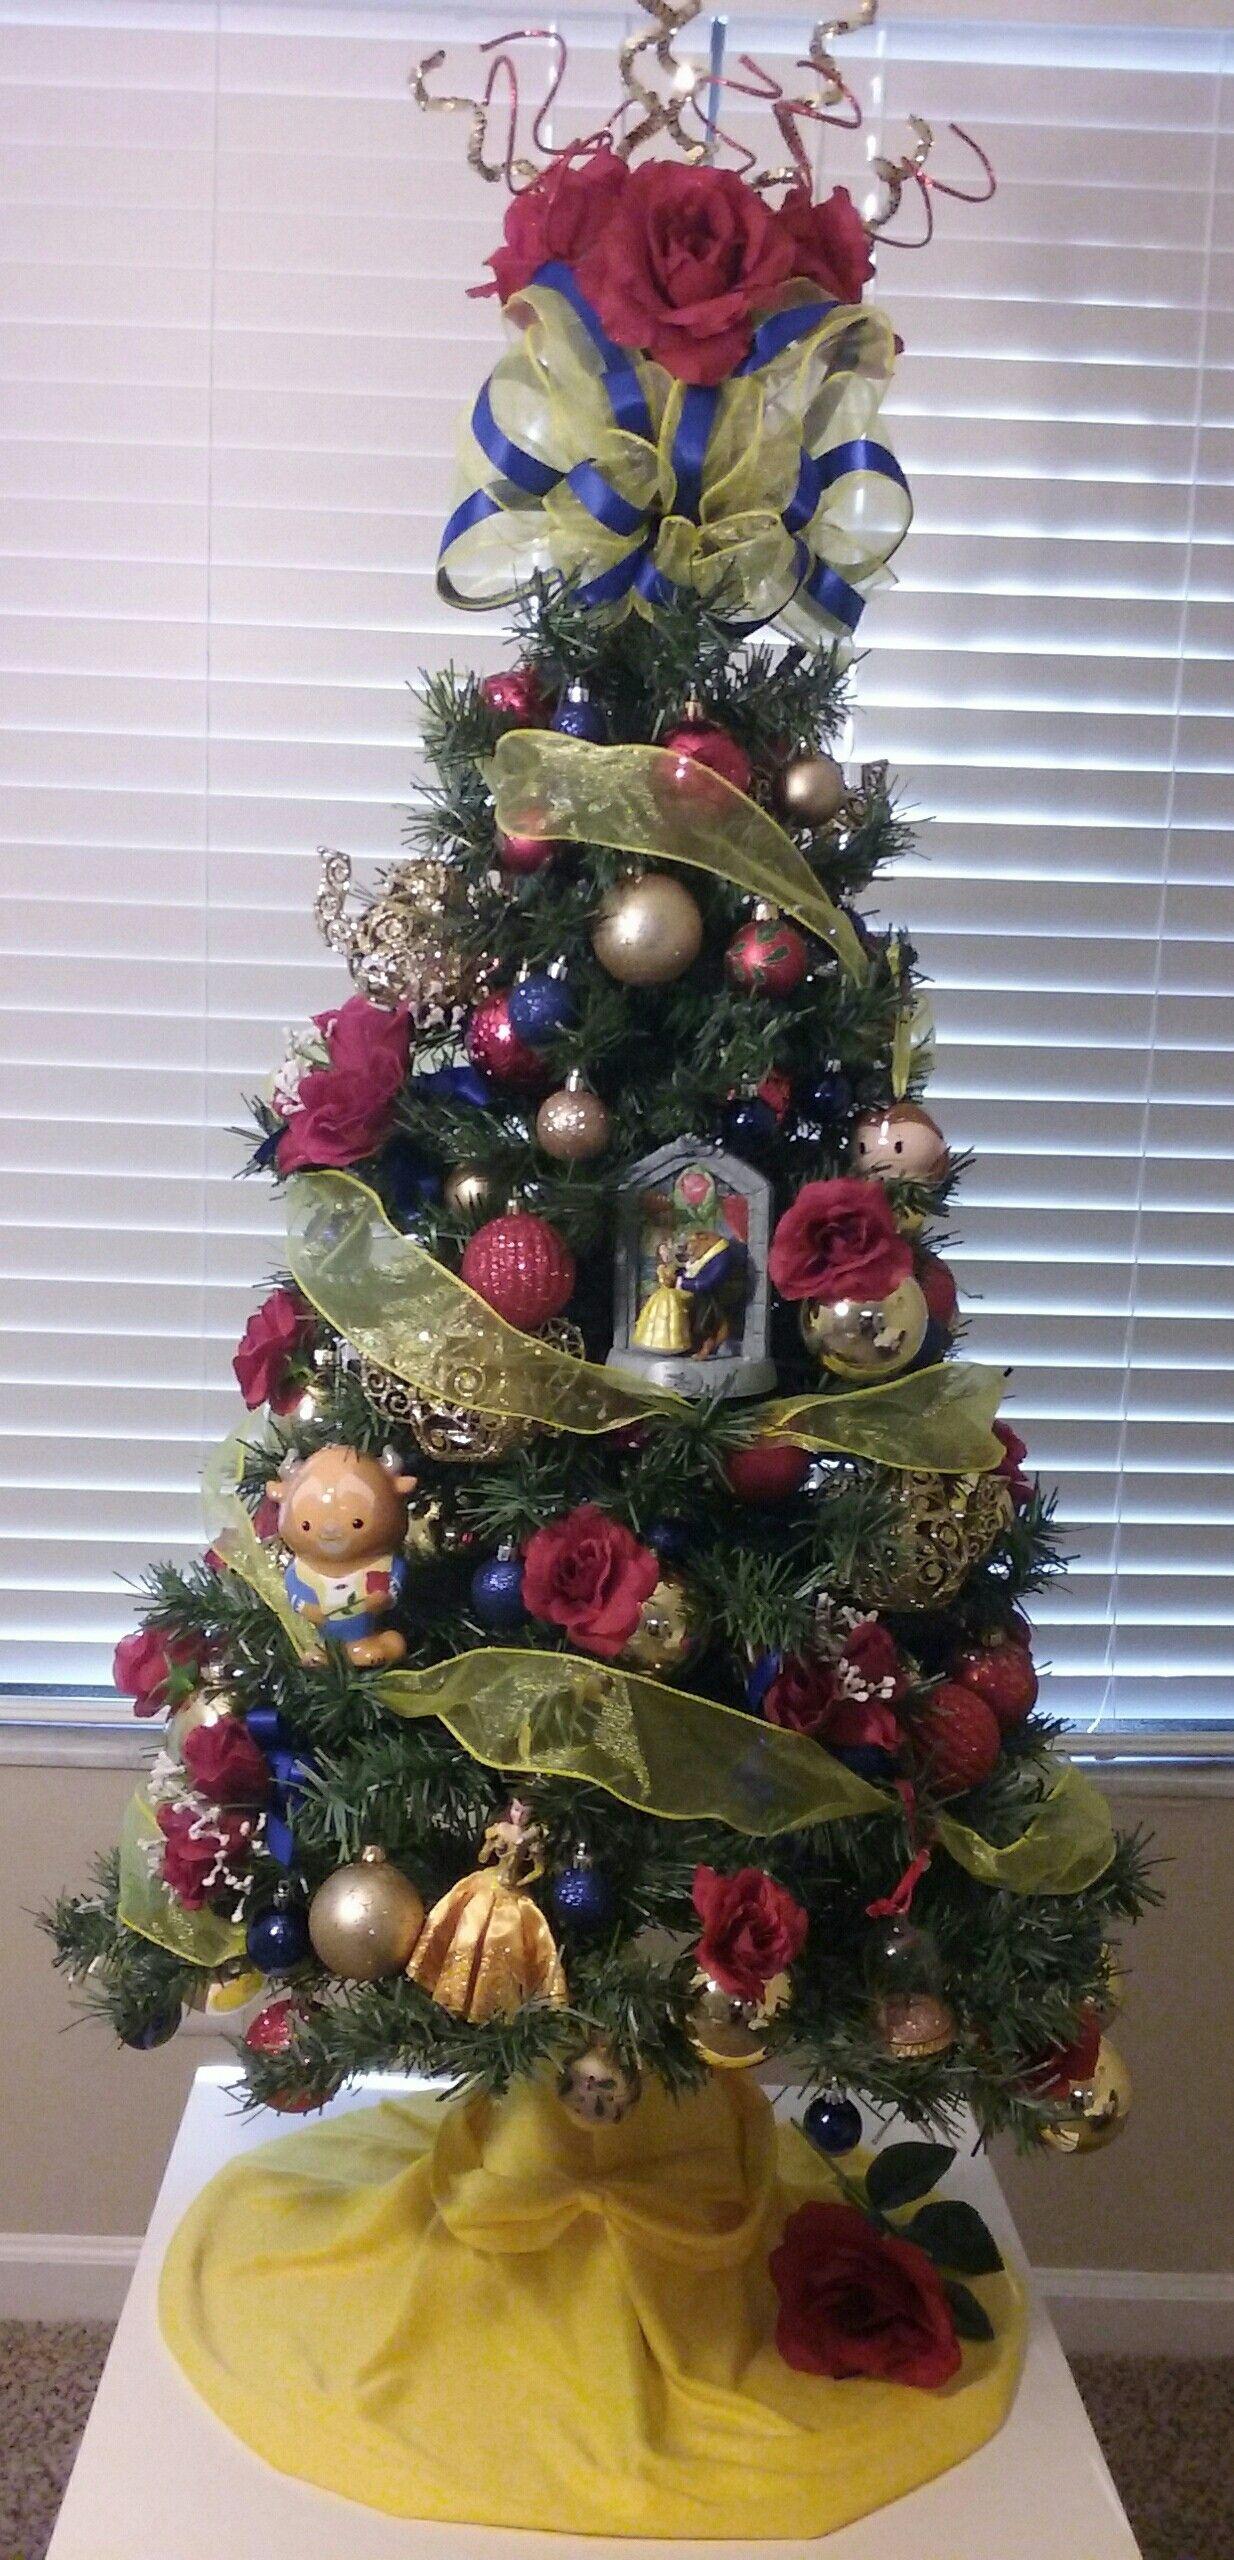 Disney tree ornaments - Beauty And The Beast Christmas Tree